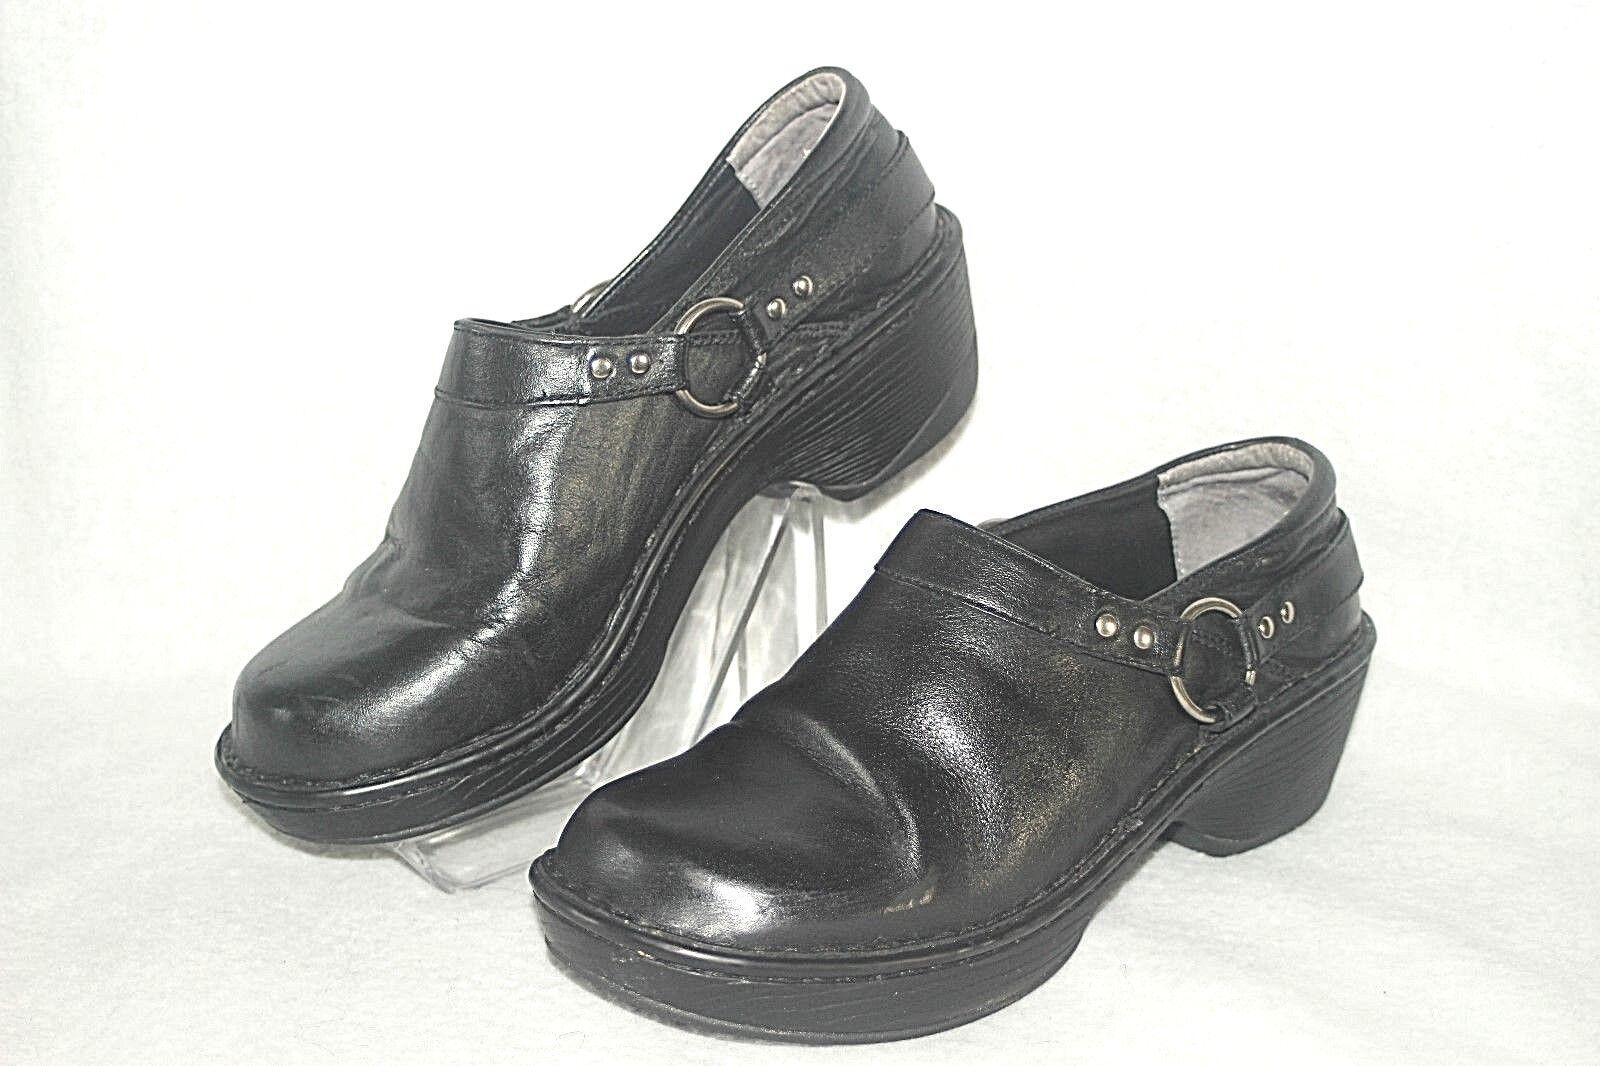 DURANGO DREAM ~ Black Leather Low Ankle Boots / Shoes Sz 9.5 M * VERY GOOD +++